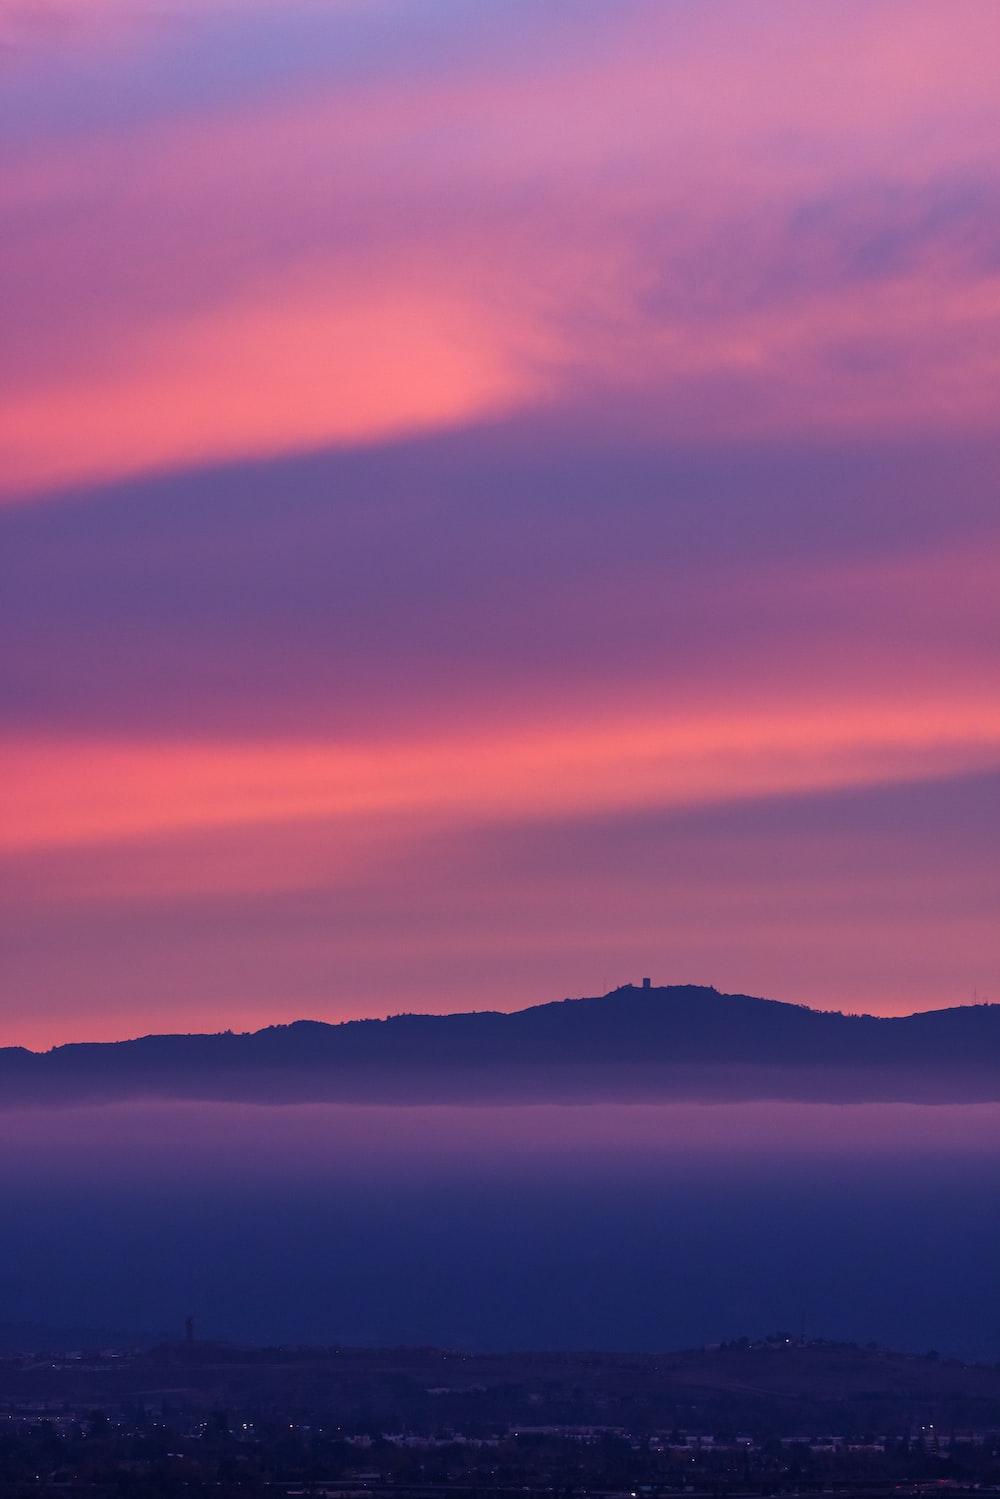 silhouette of mountain under purple sky